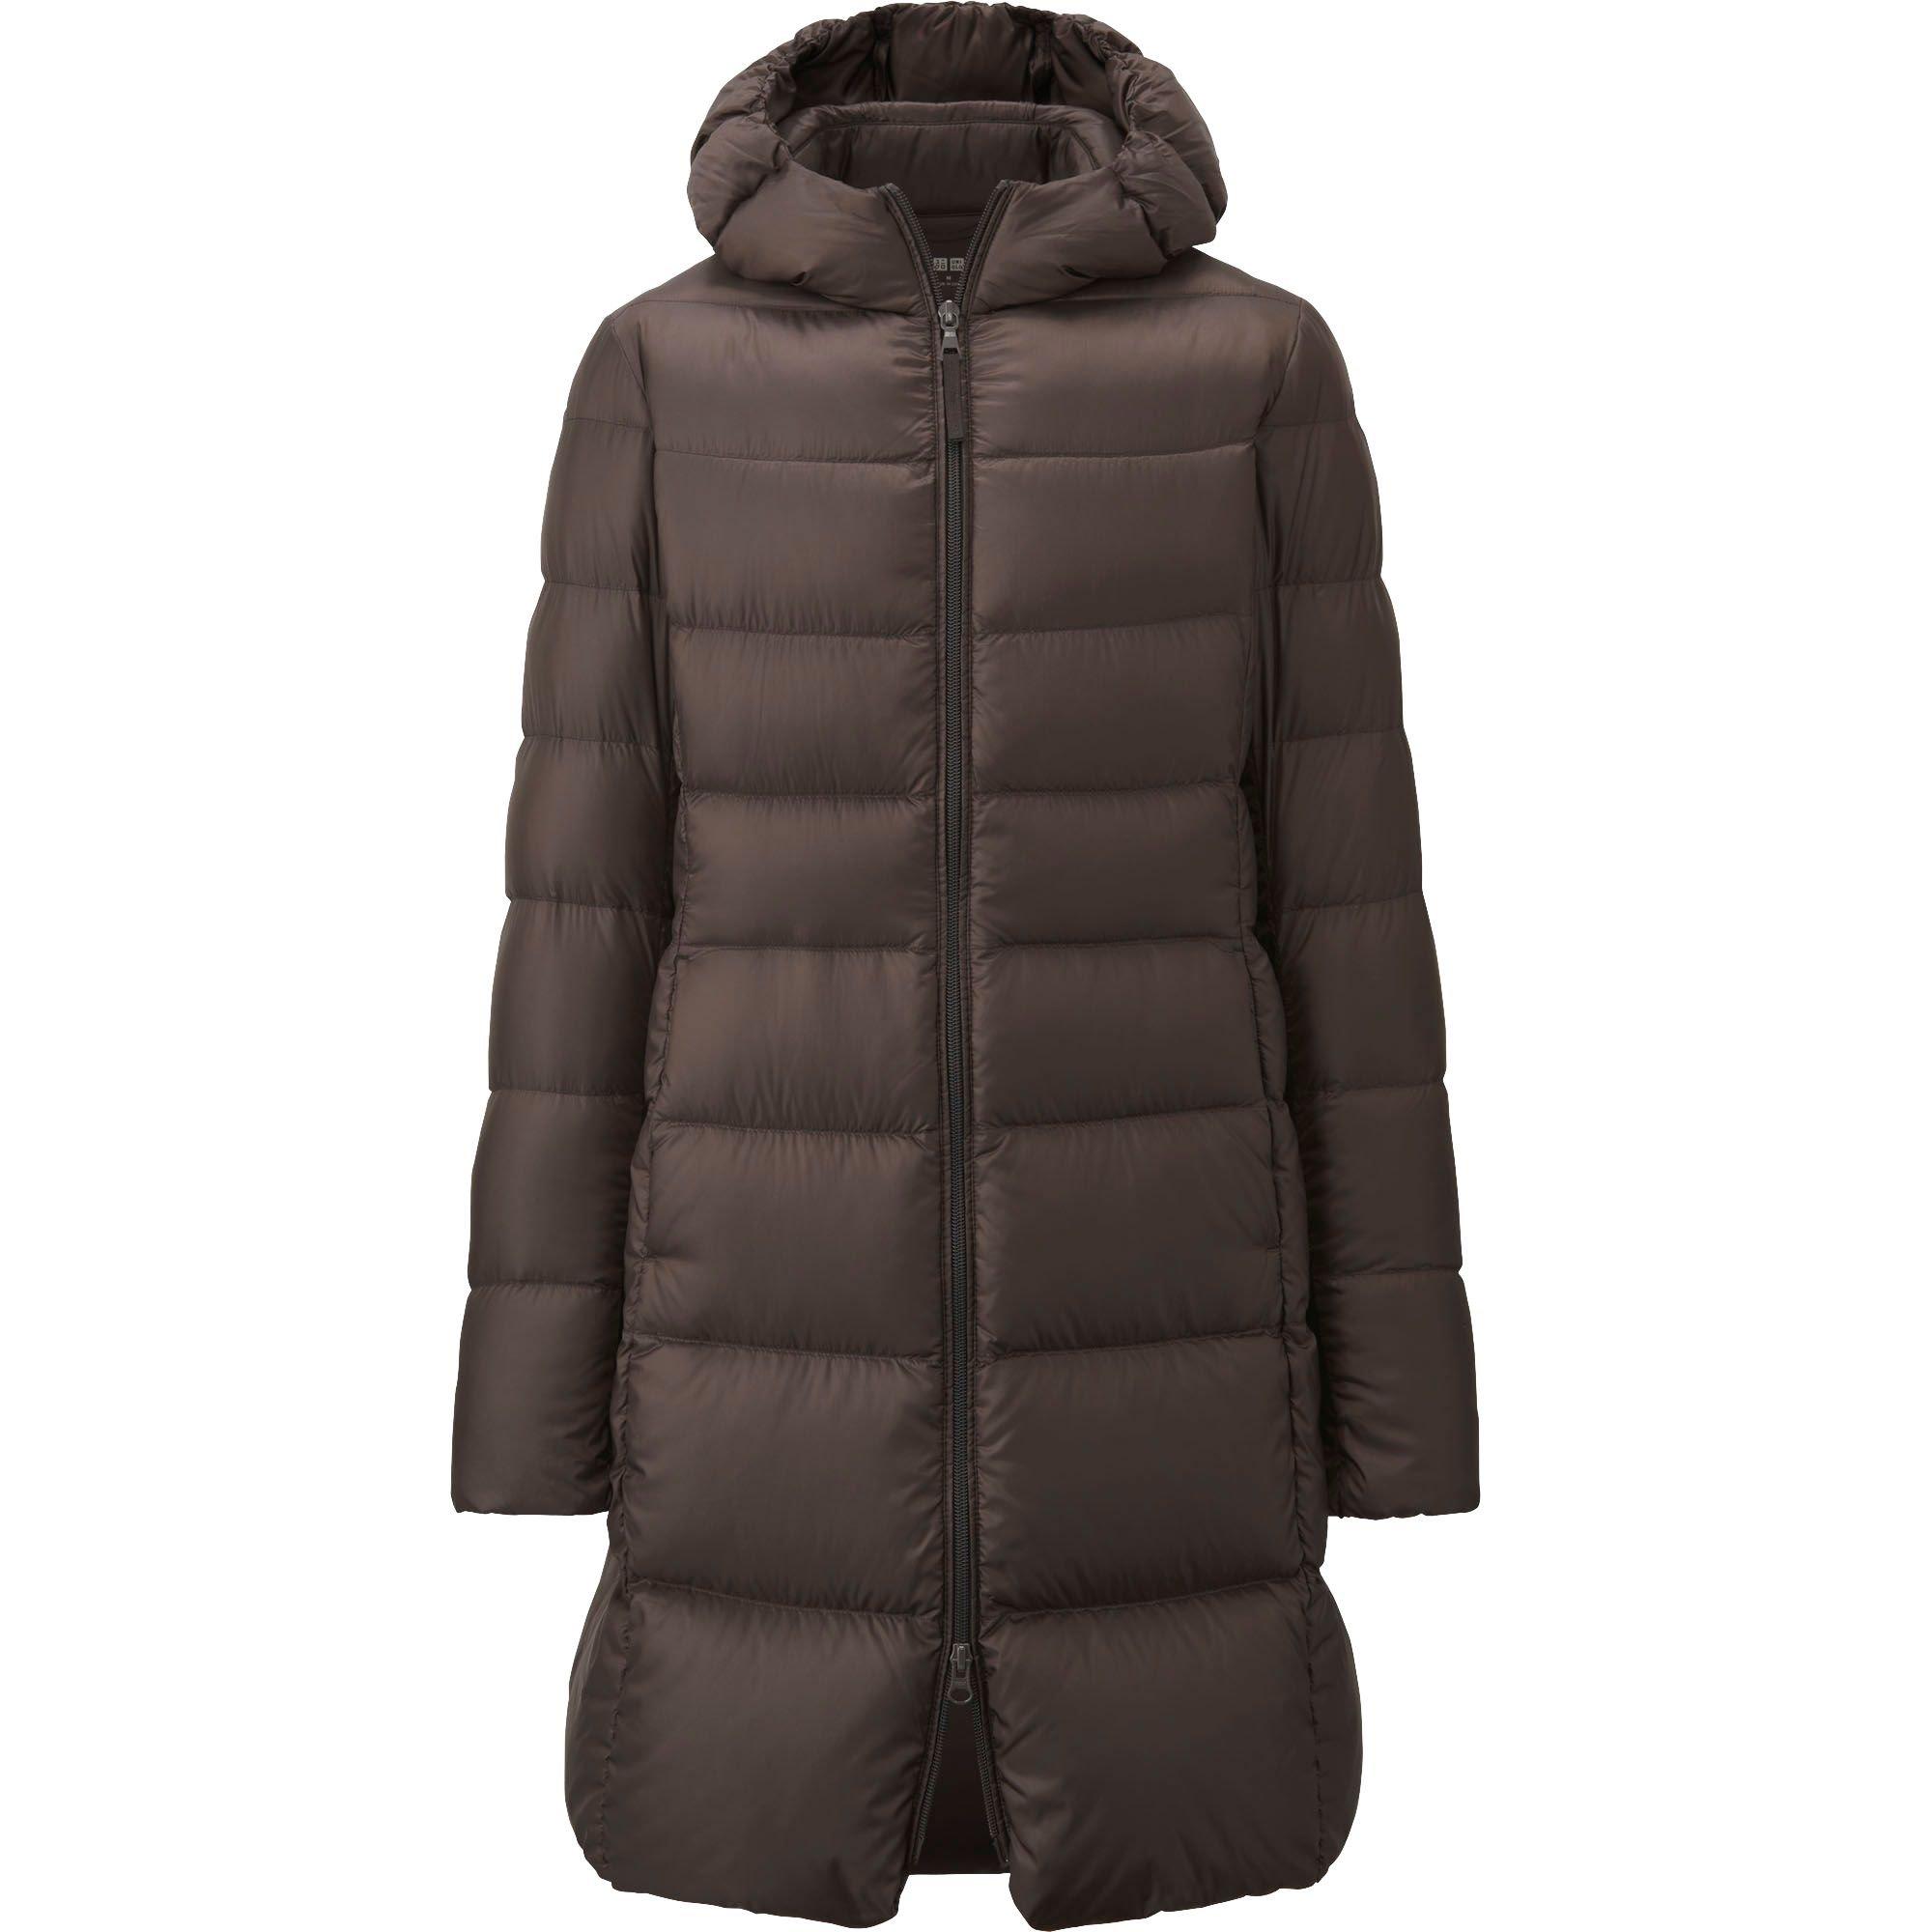 Uniqlo Ultra Light Down Hooded Coat In Brown Dark Brown